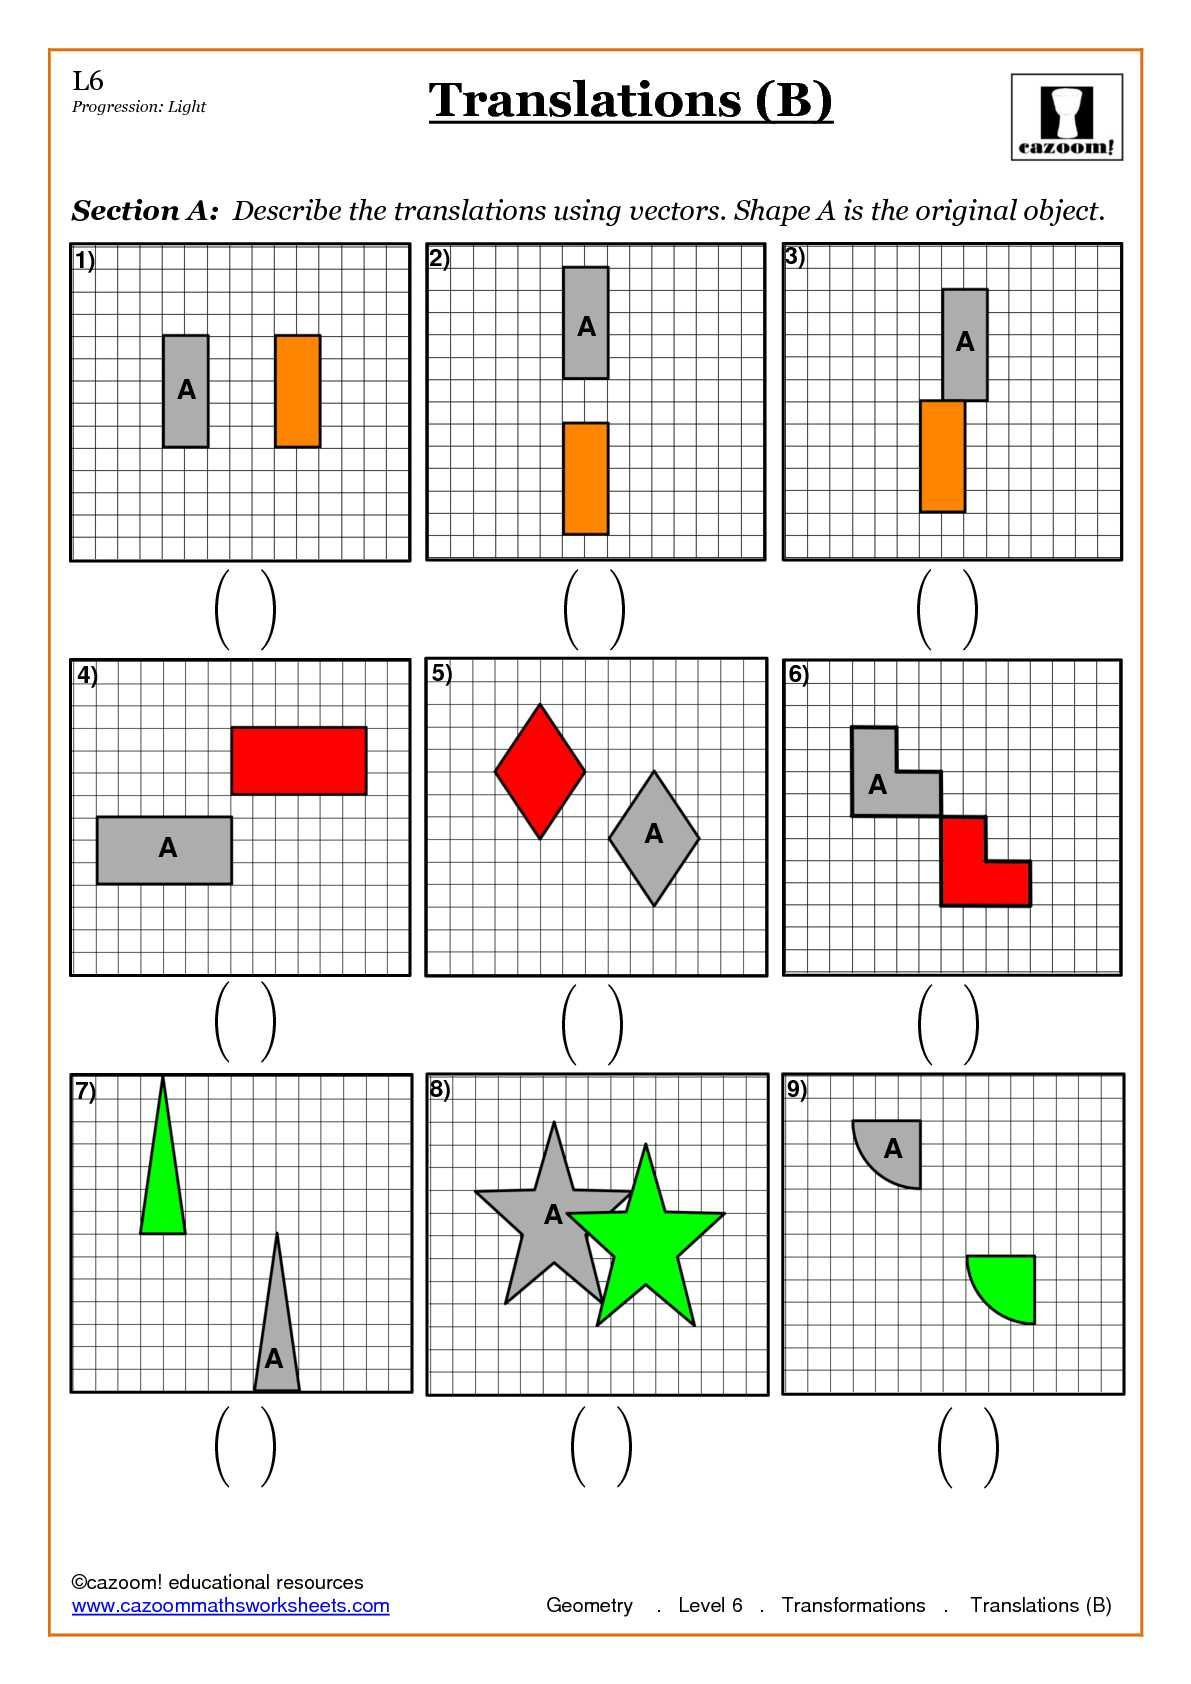 Geometry Transformation Composition Worksheet Answers Translating Shapes Worksheet